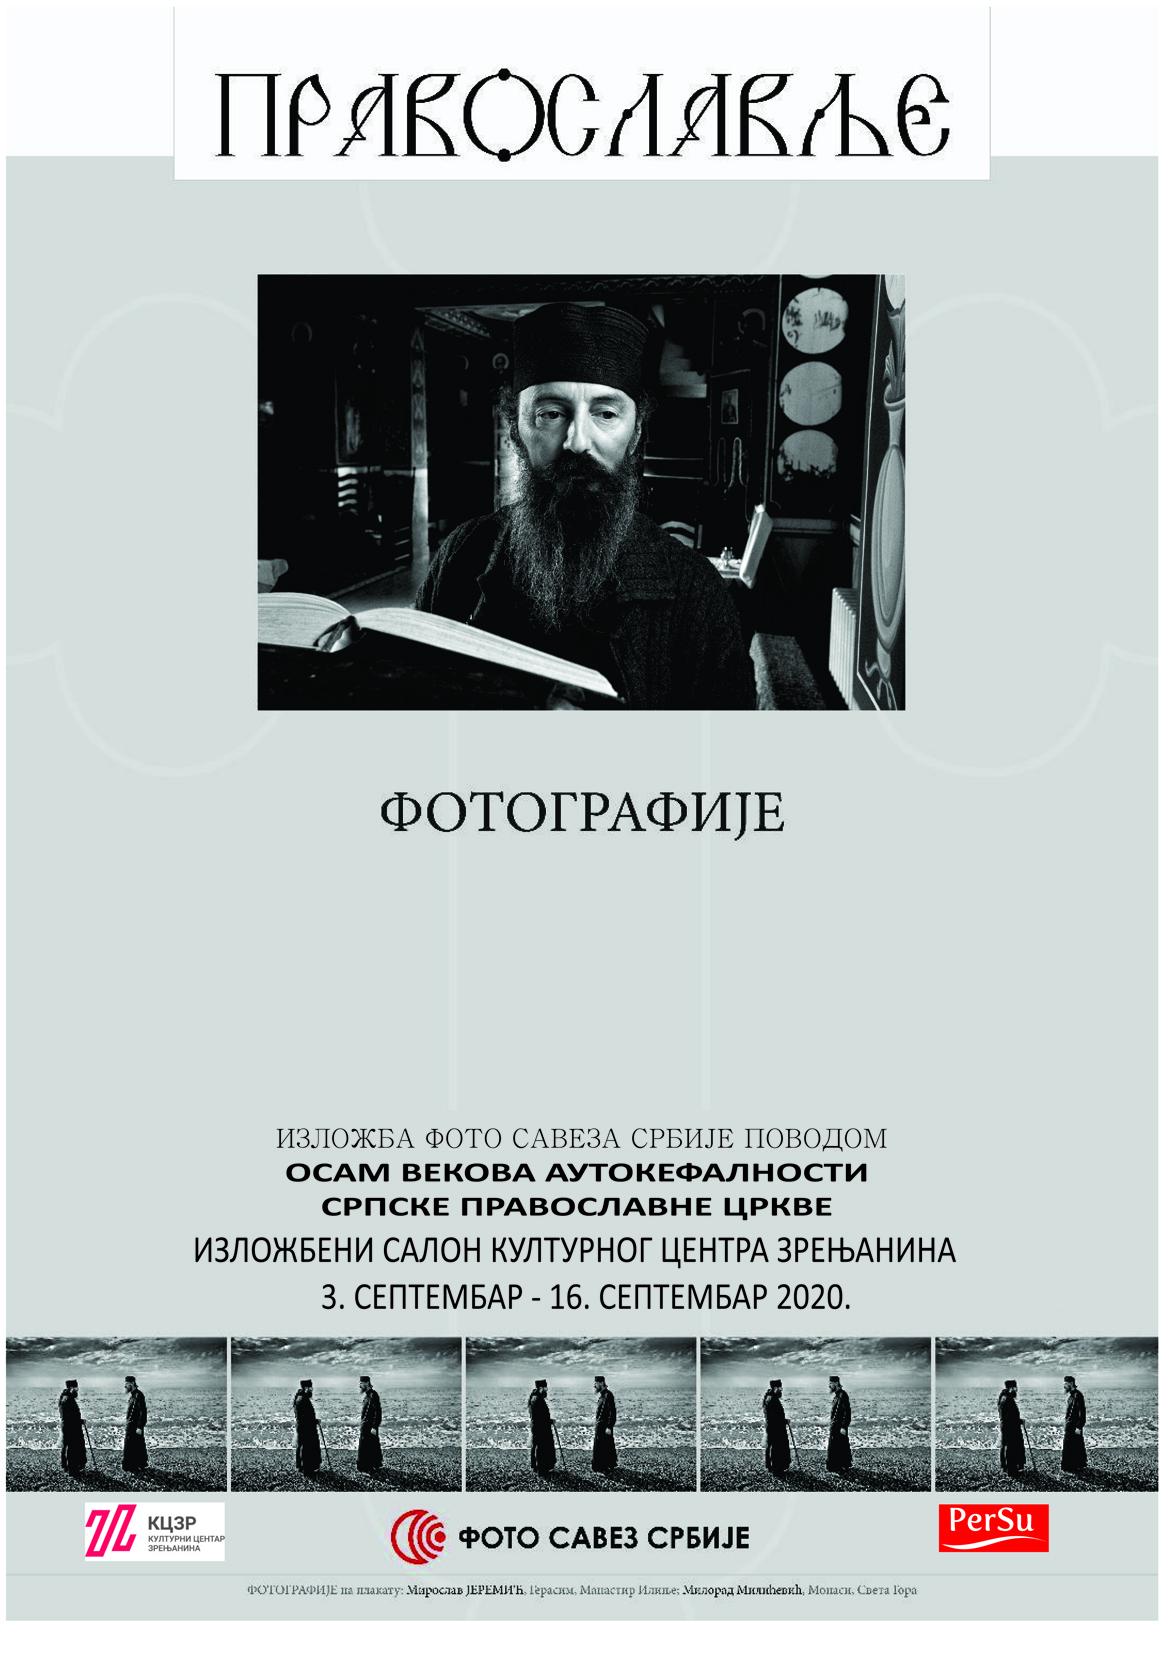 plakat-A3-Izložba pravoslavlje-3. IX 2020.-2kom.cdr